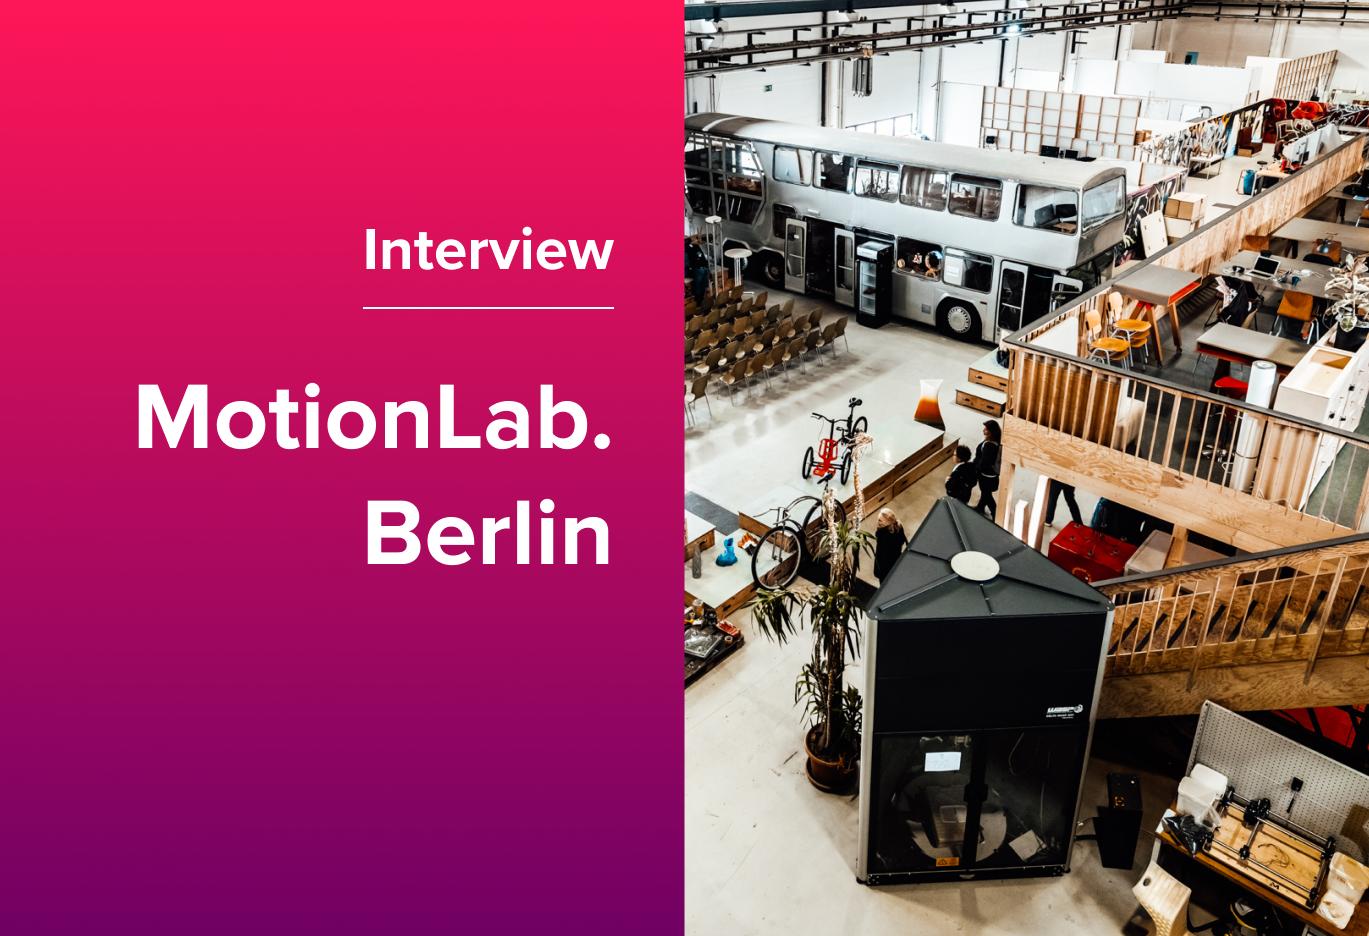 deskbird Coworking Spaces: Nice to Meet You, MotionLab.Berlin!